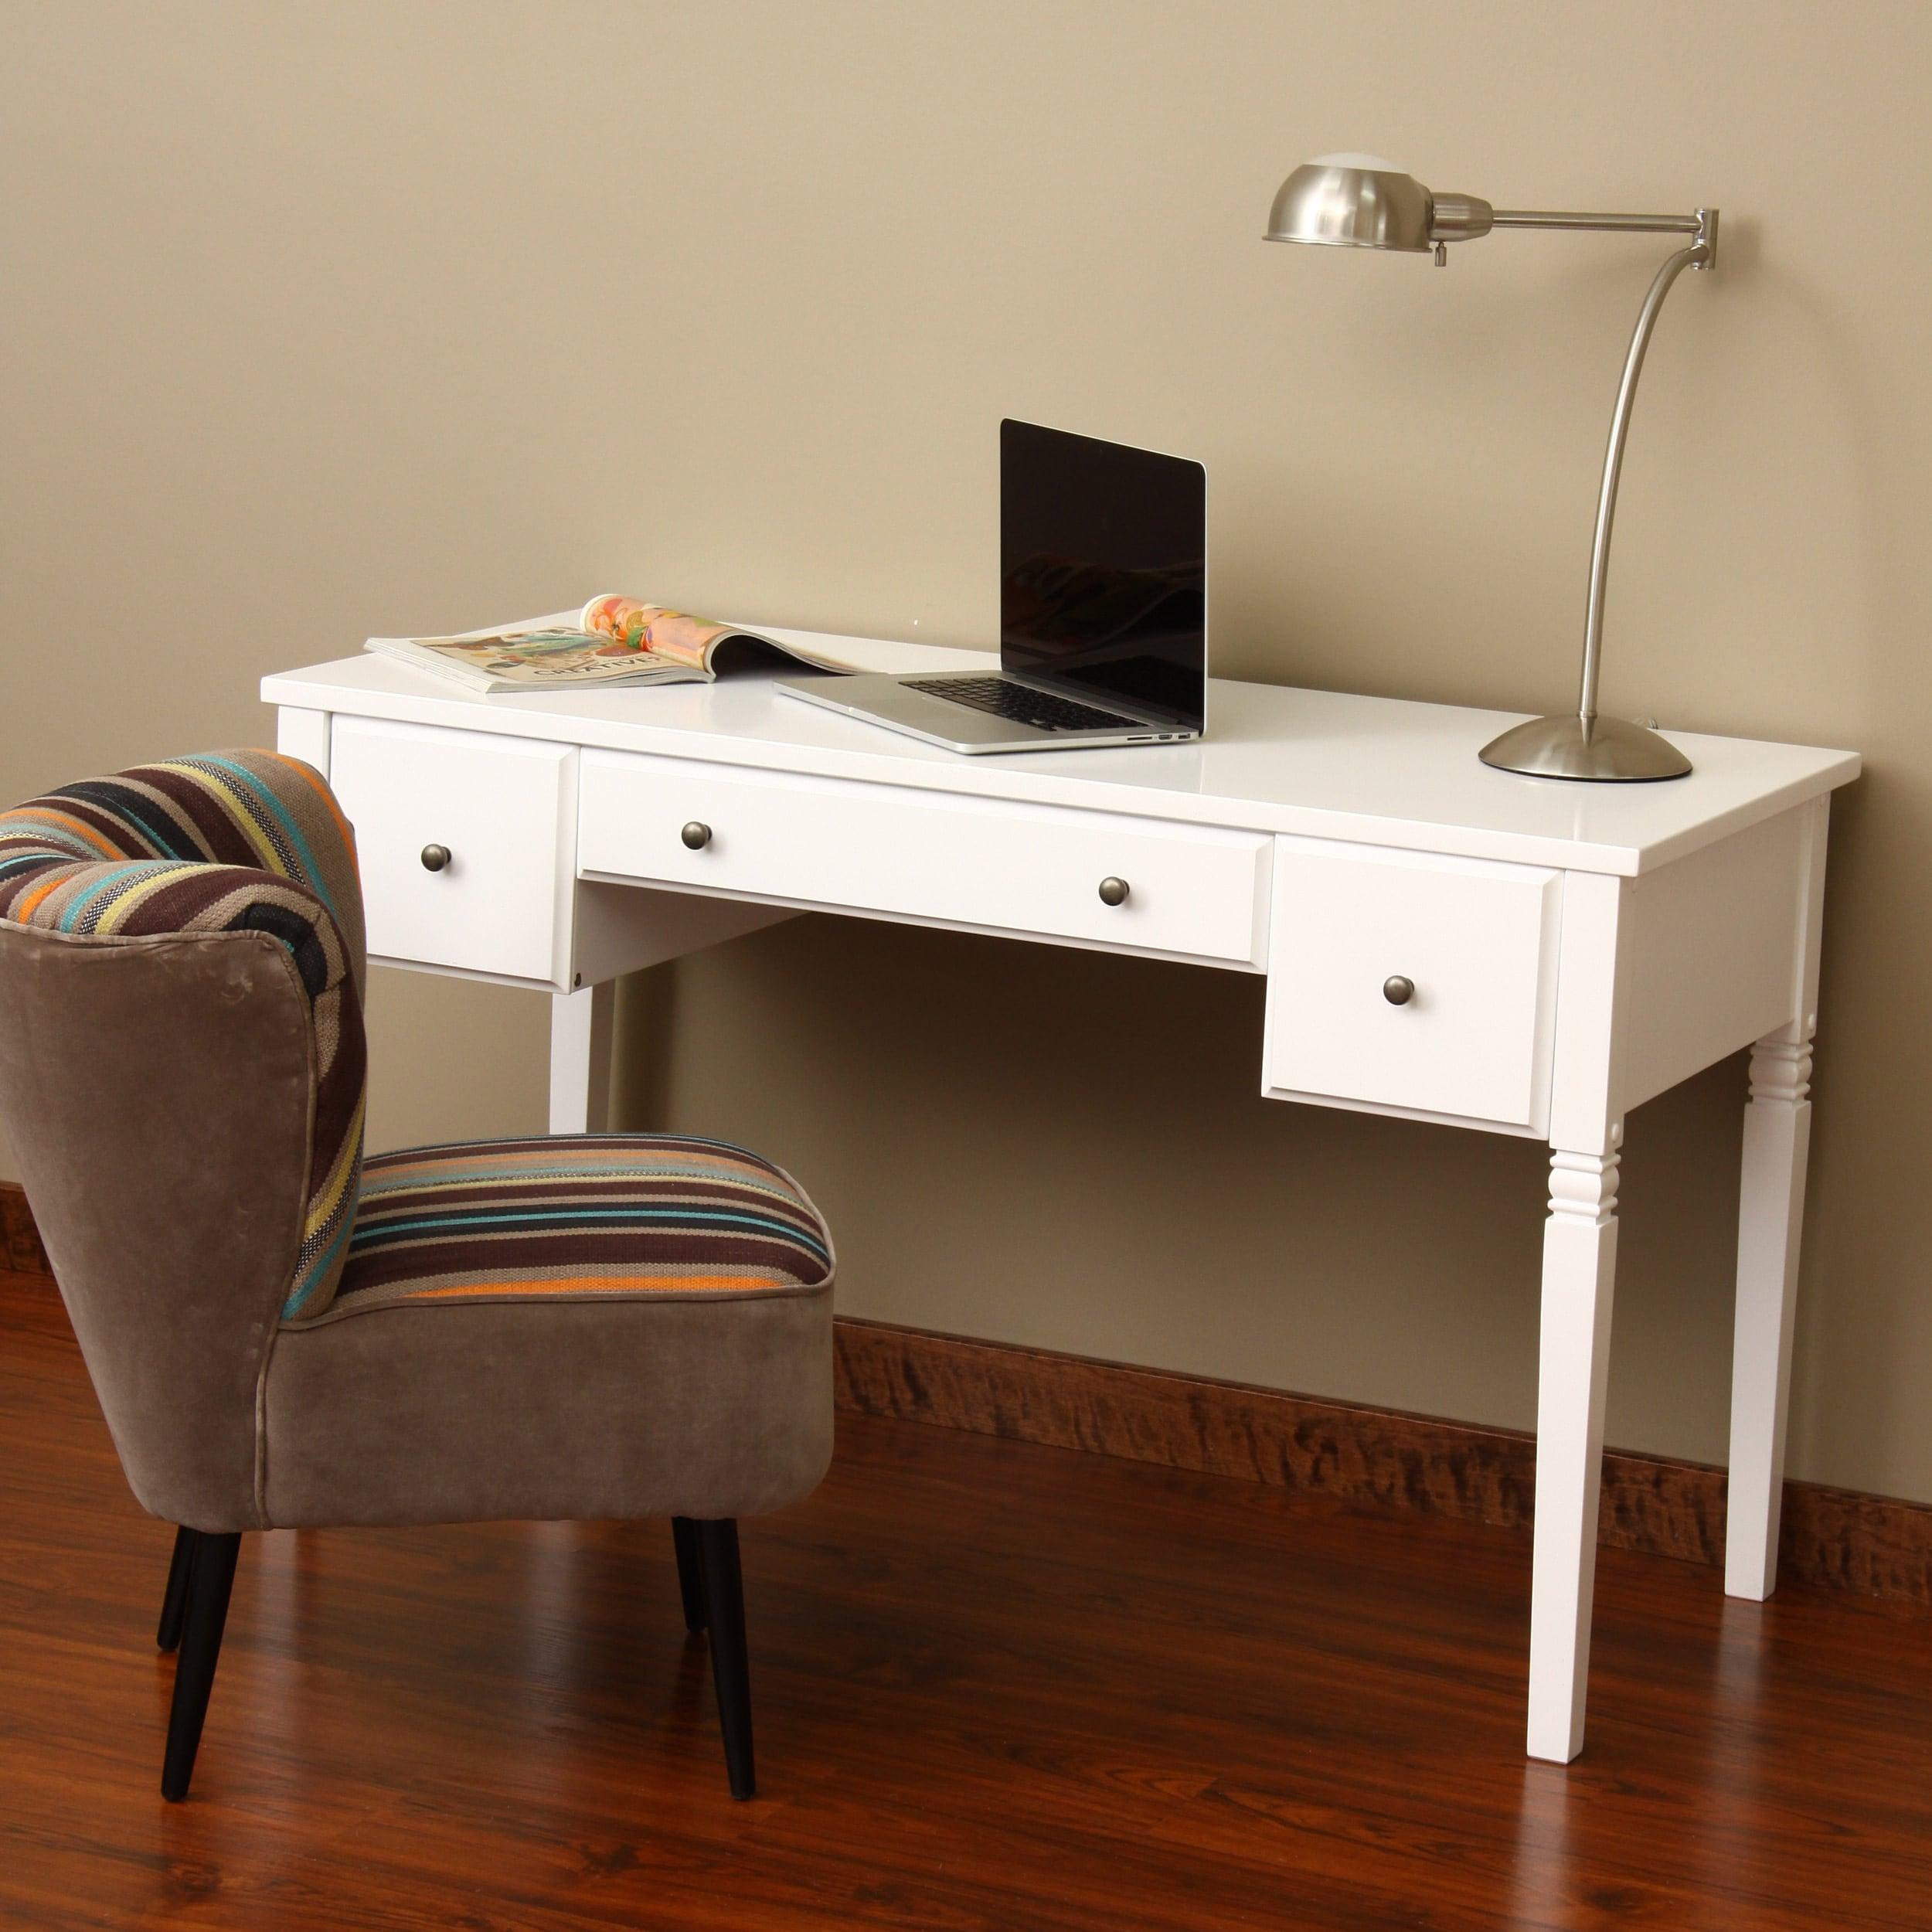 1cheap Cami White 3 Drawer Writing Desk Best Office